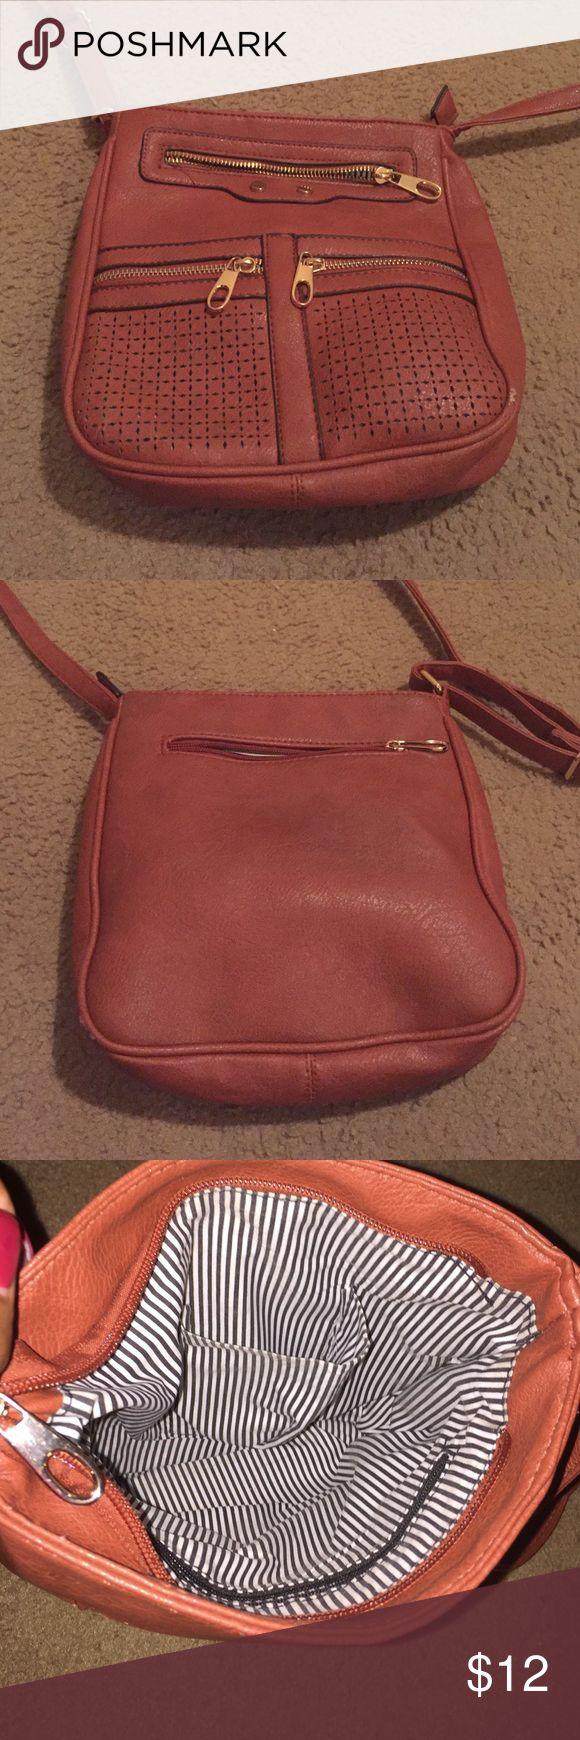 Crossbody bag Brown. Still new. Bags Crossbody Bags